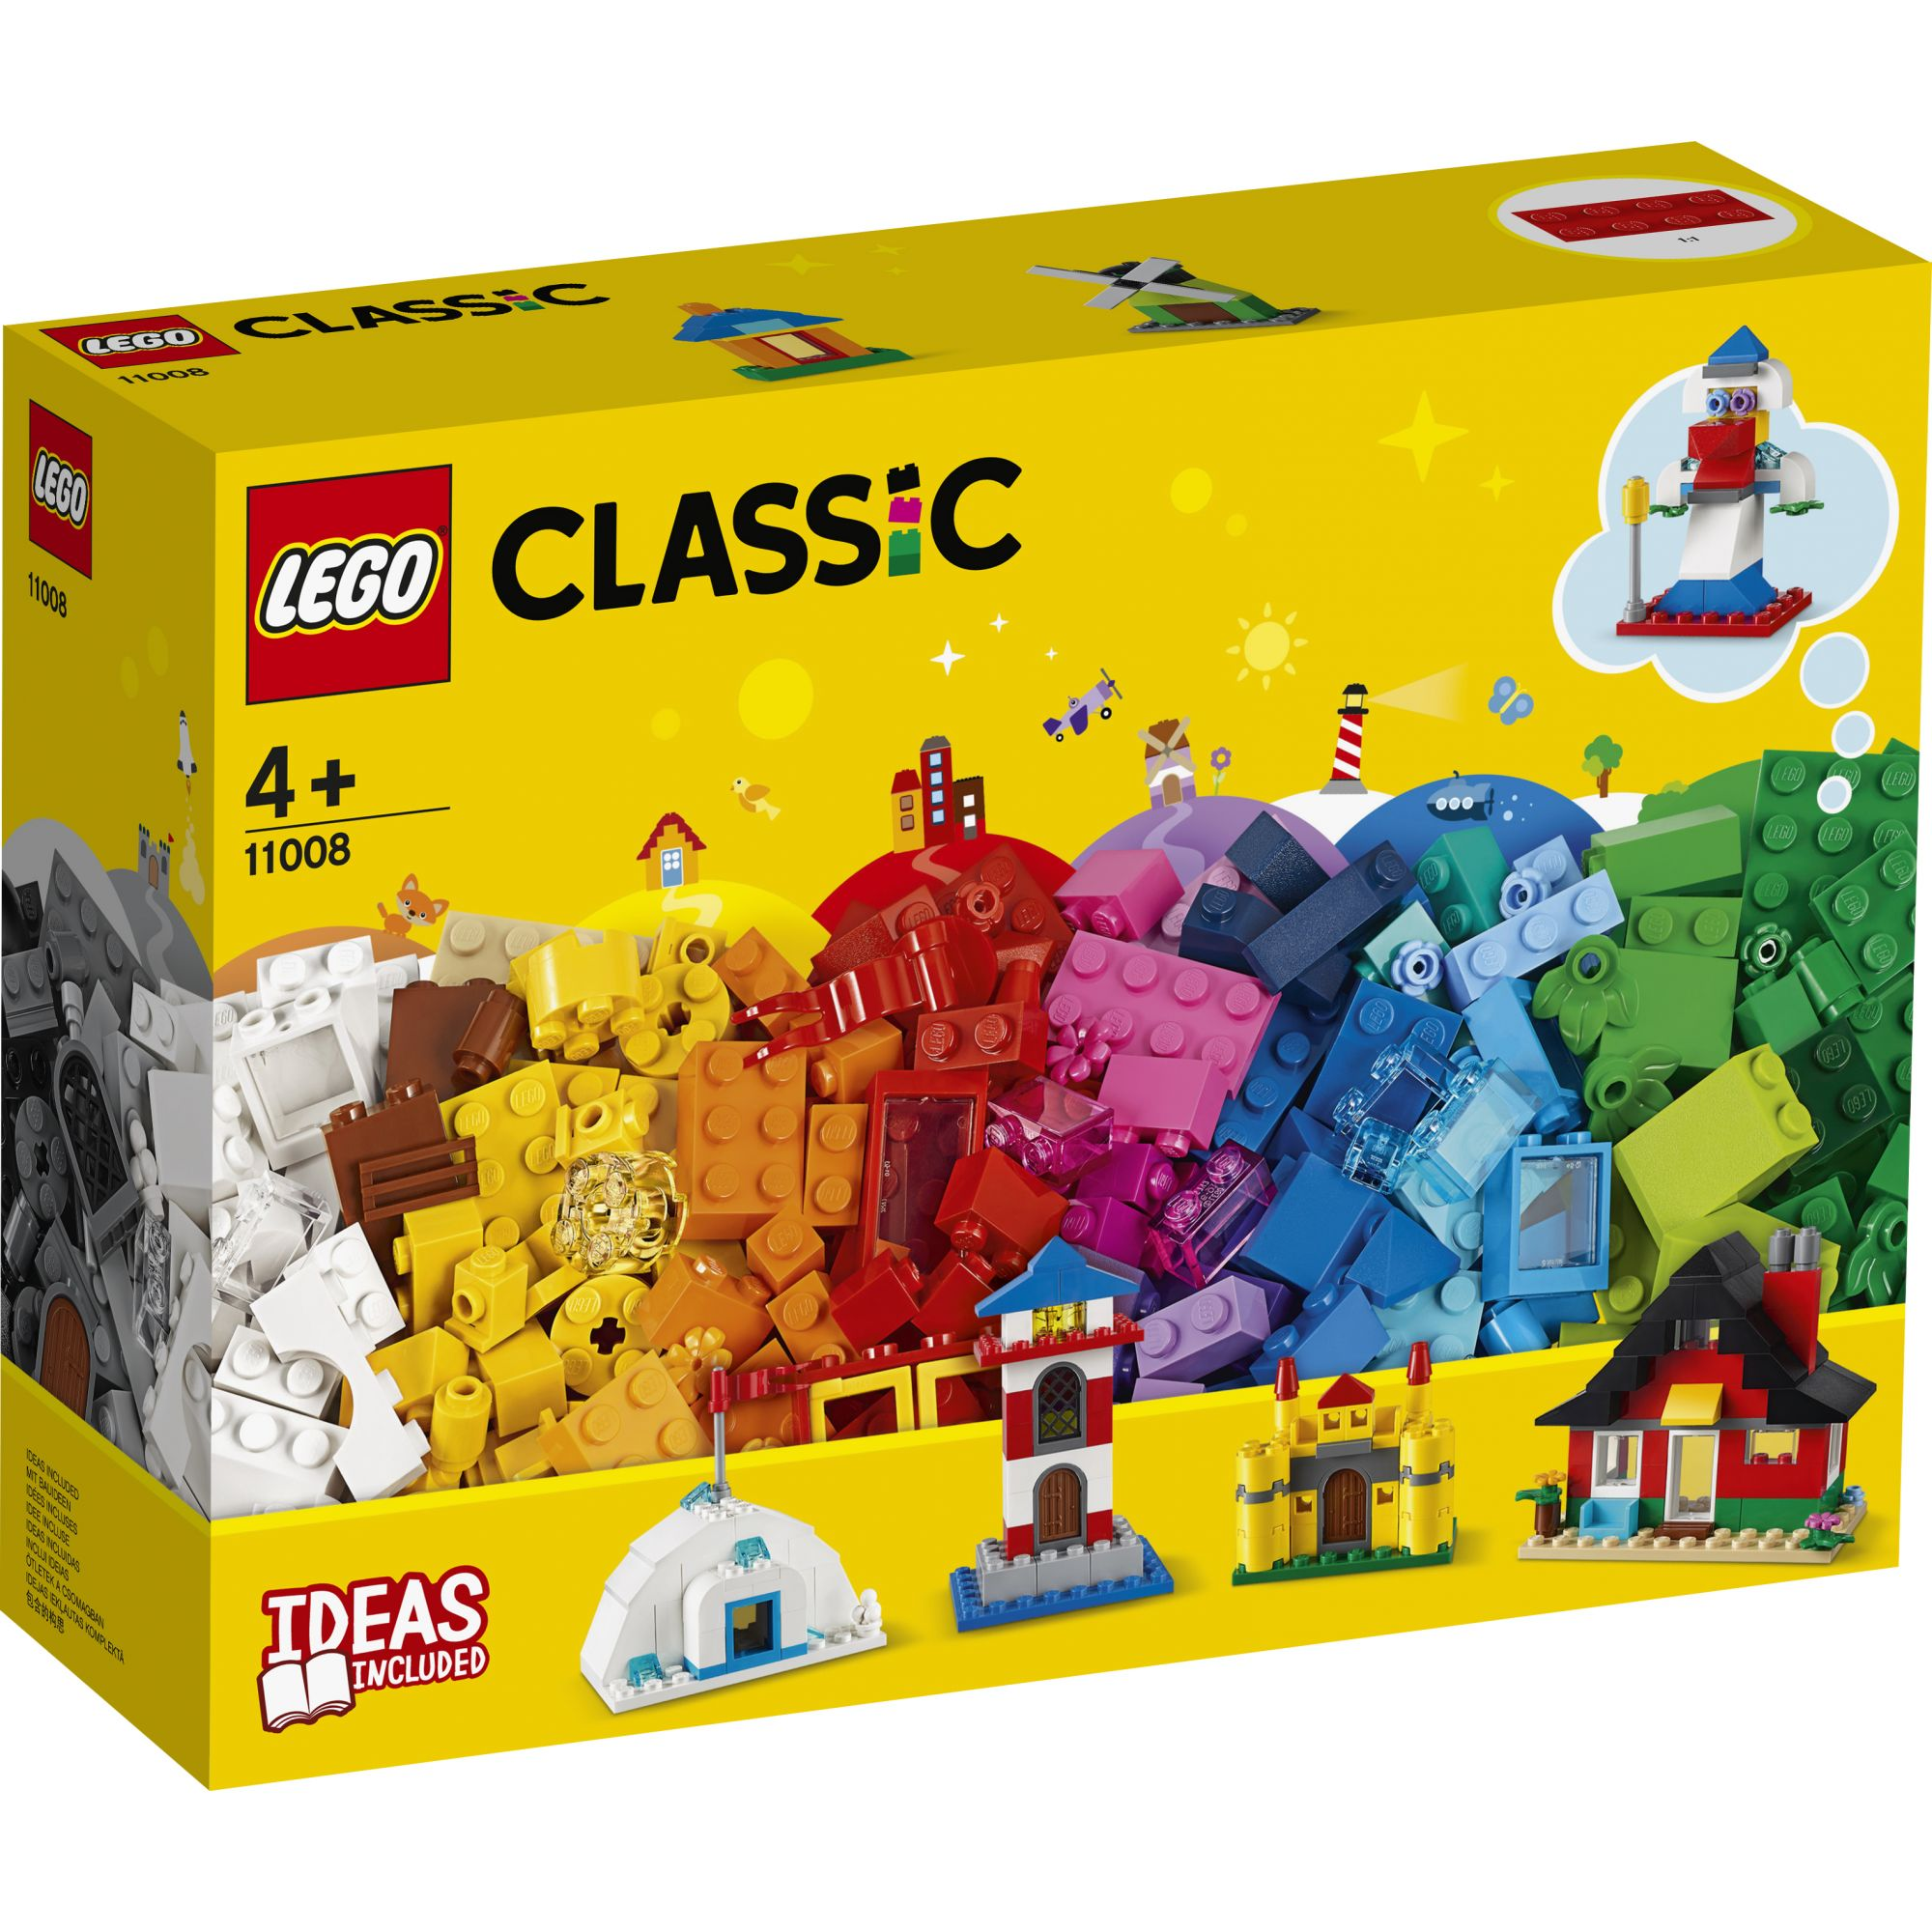 LEGO Classic Mattoncini e case - 11008 LEGO CLASSIC